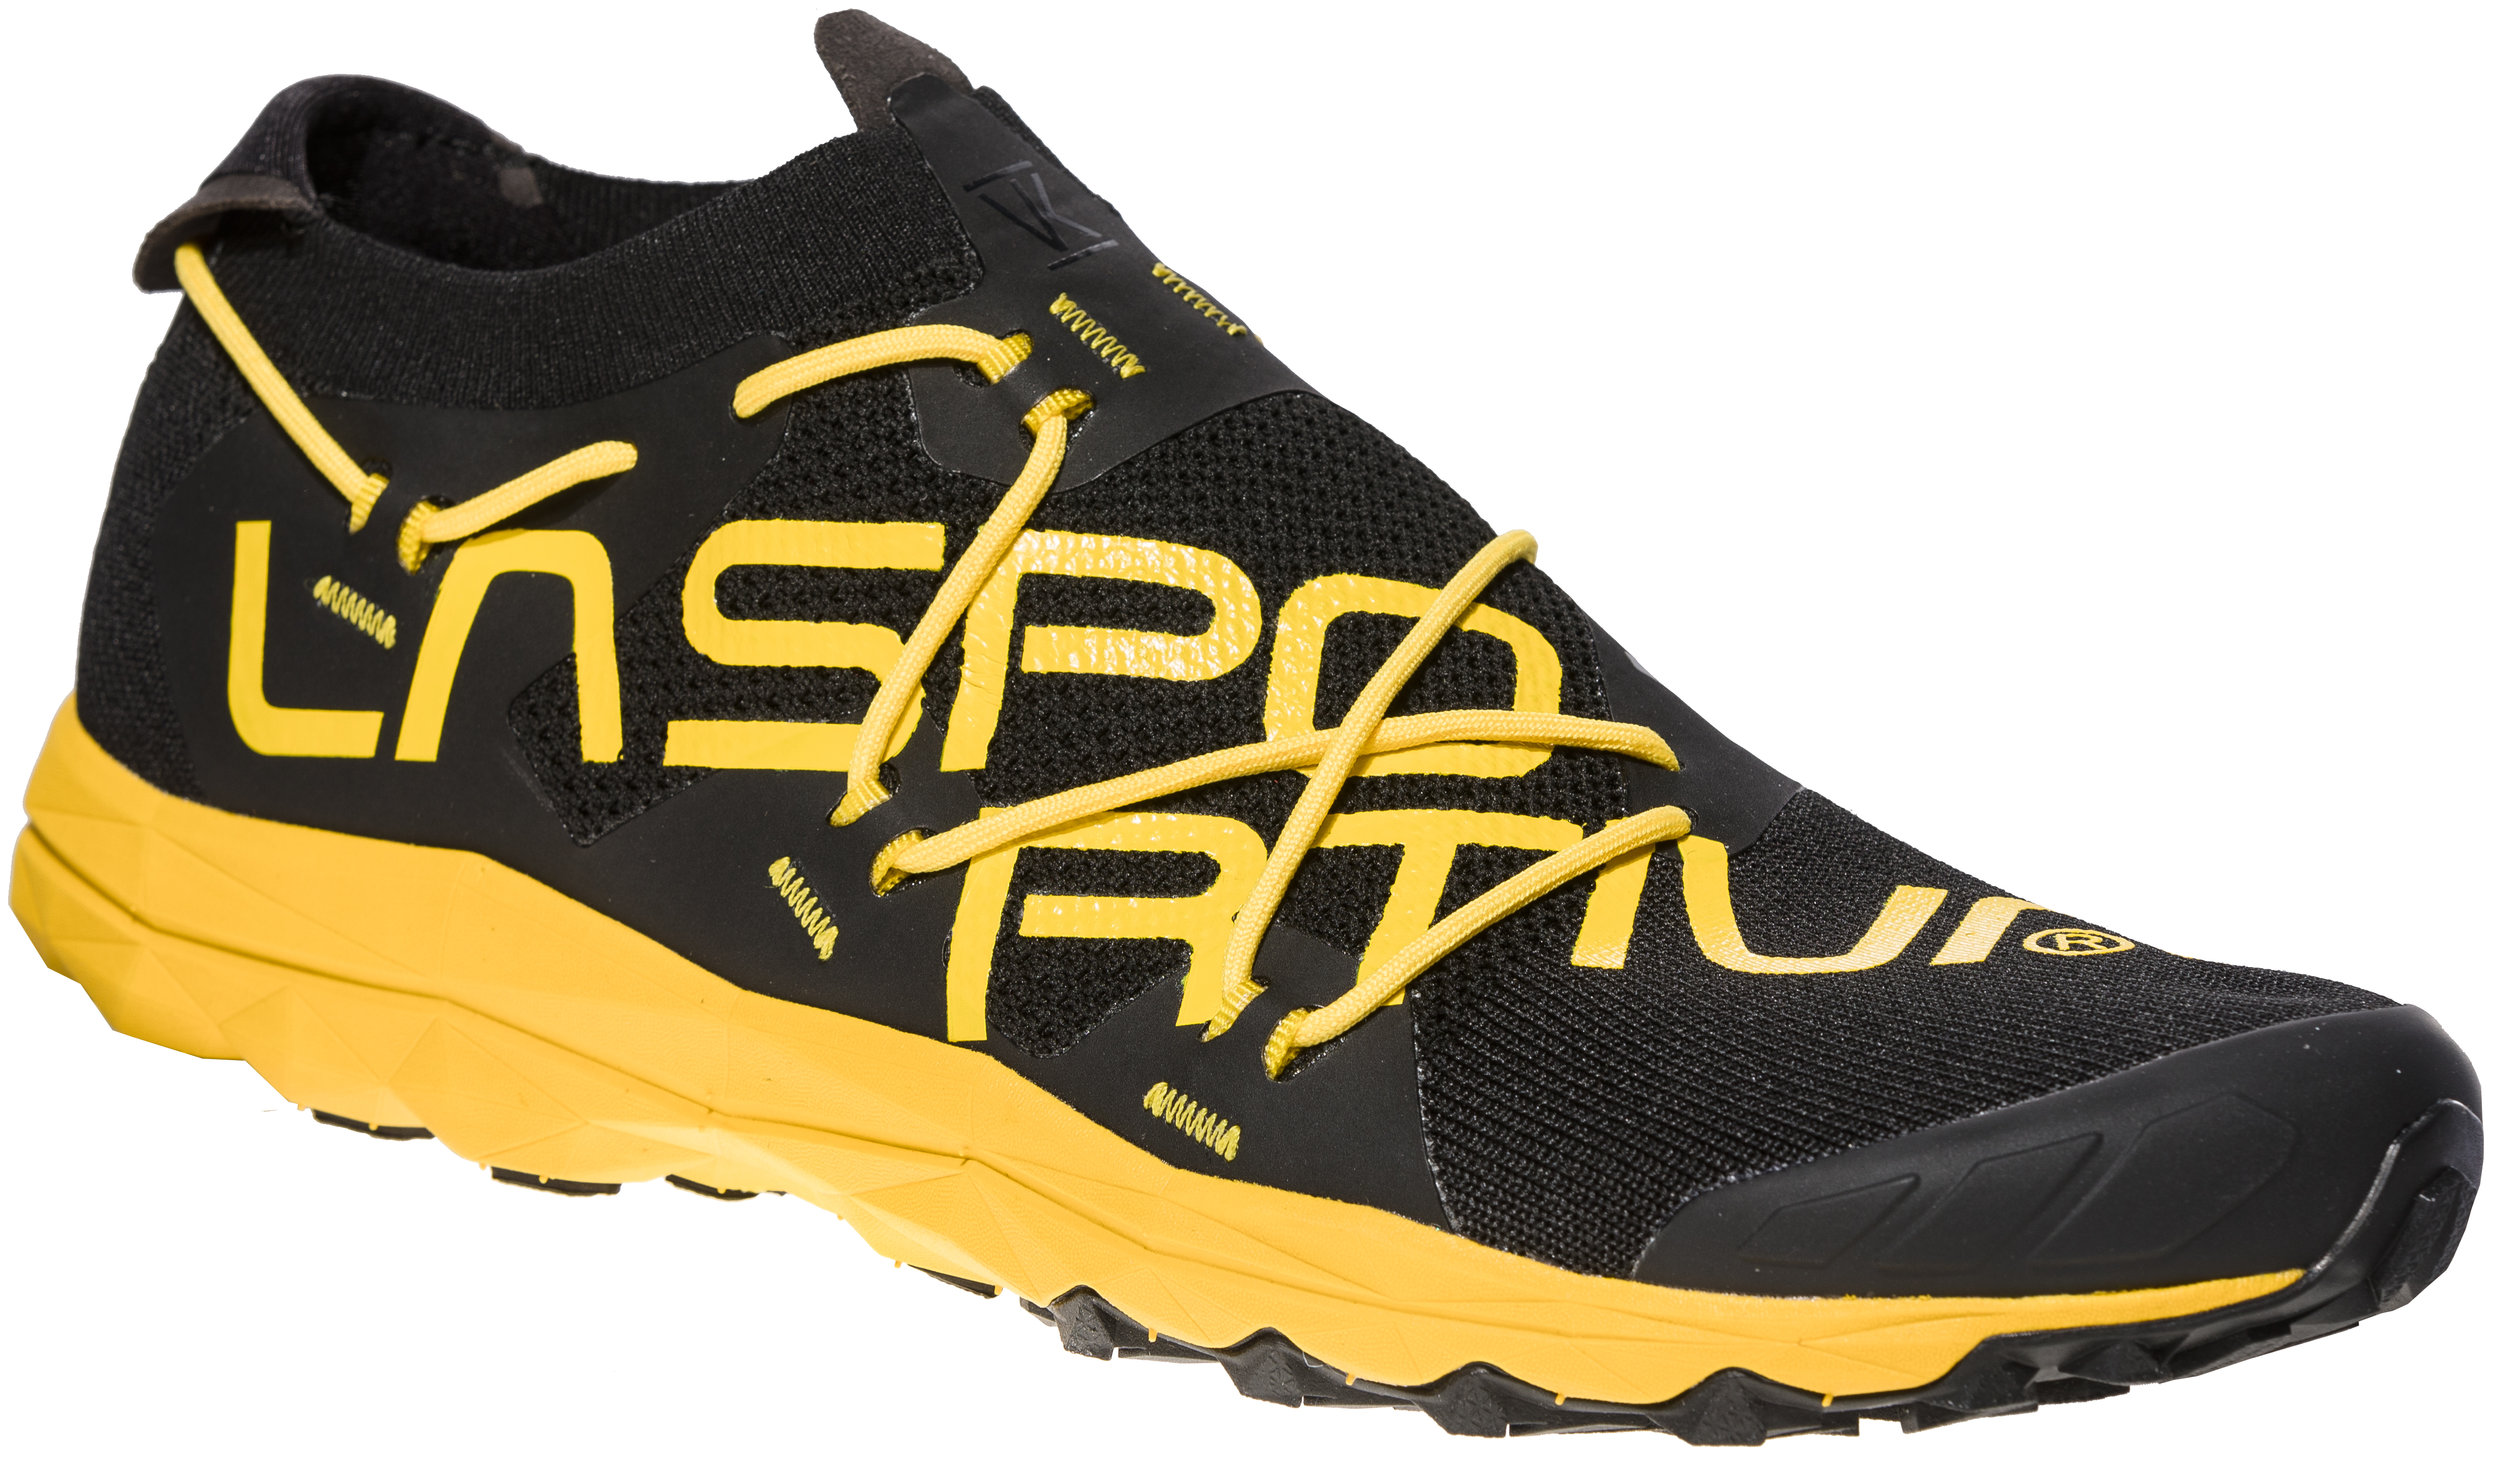 La Sportiva VK black yellow.jpg